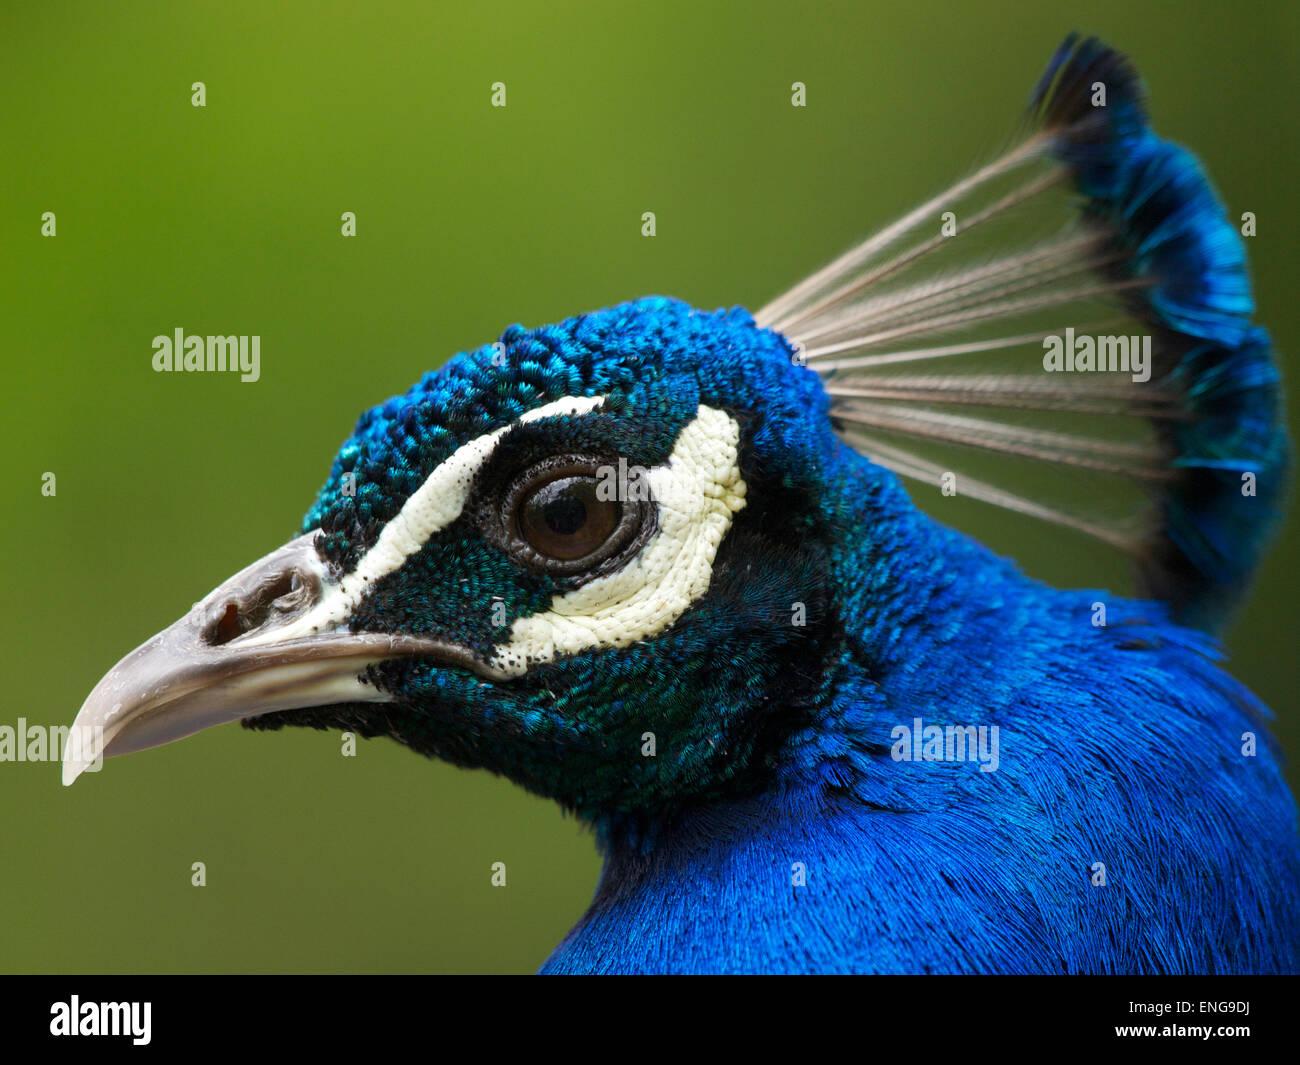 Peacock portrait Duisburg Germany - Stock Image